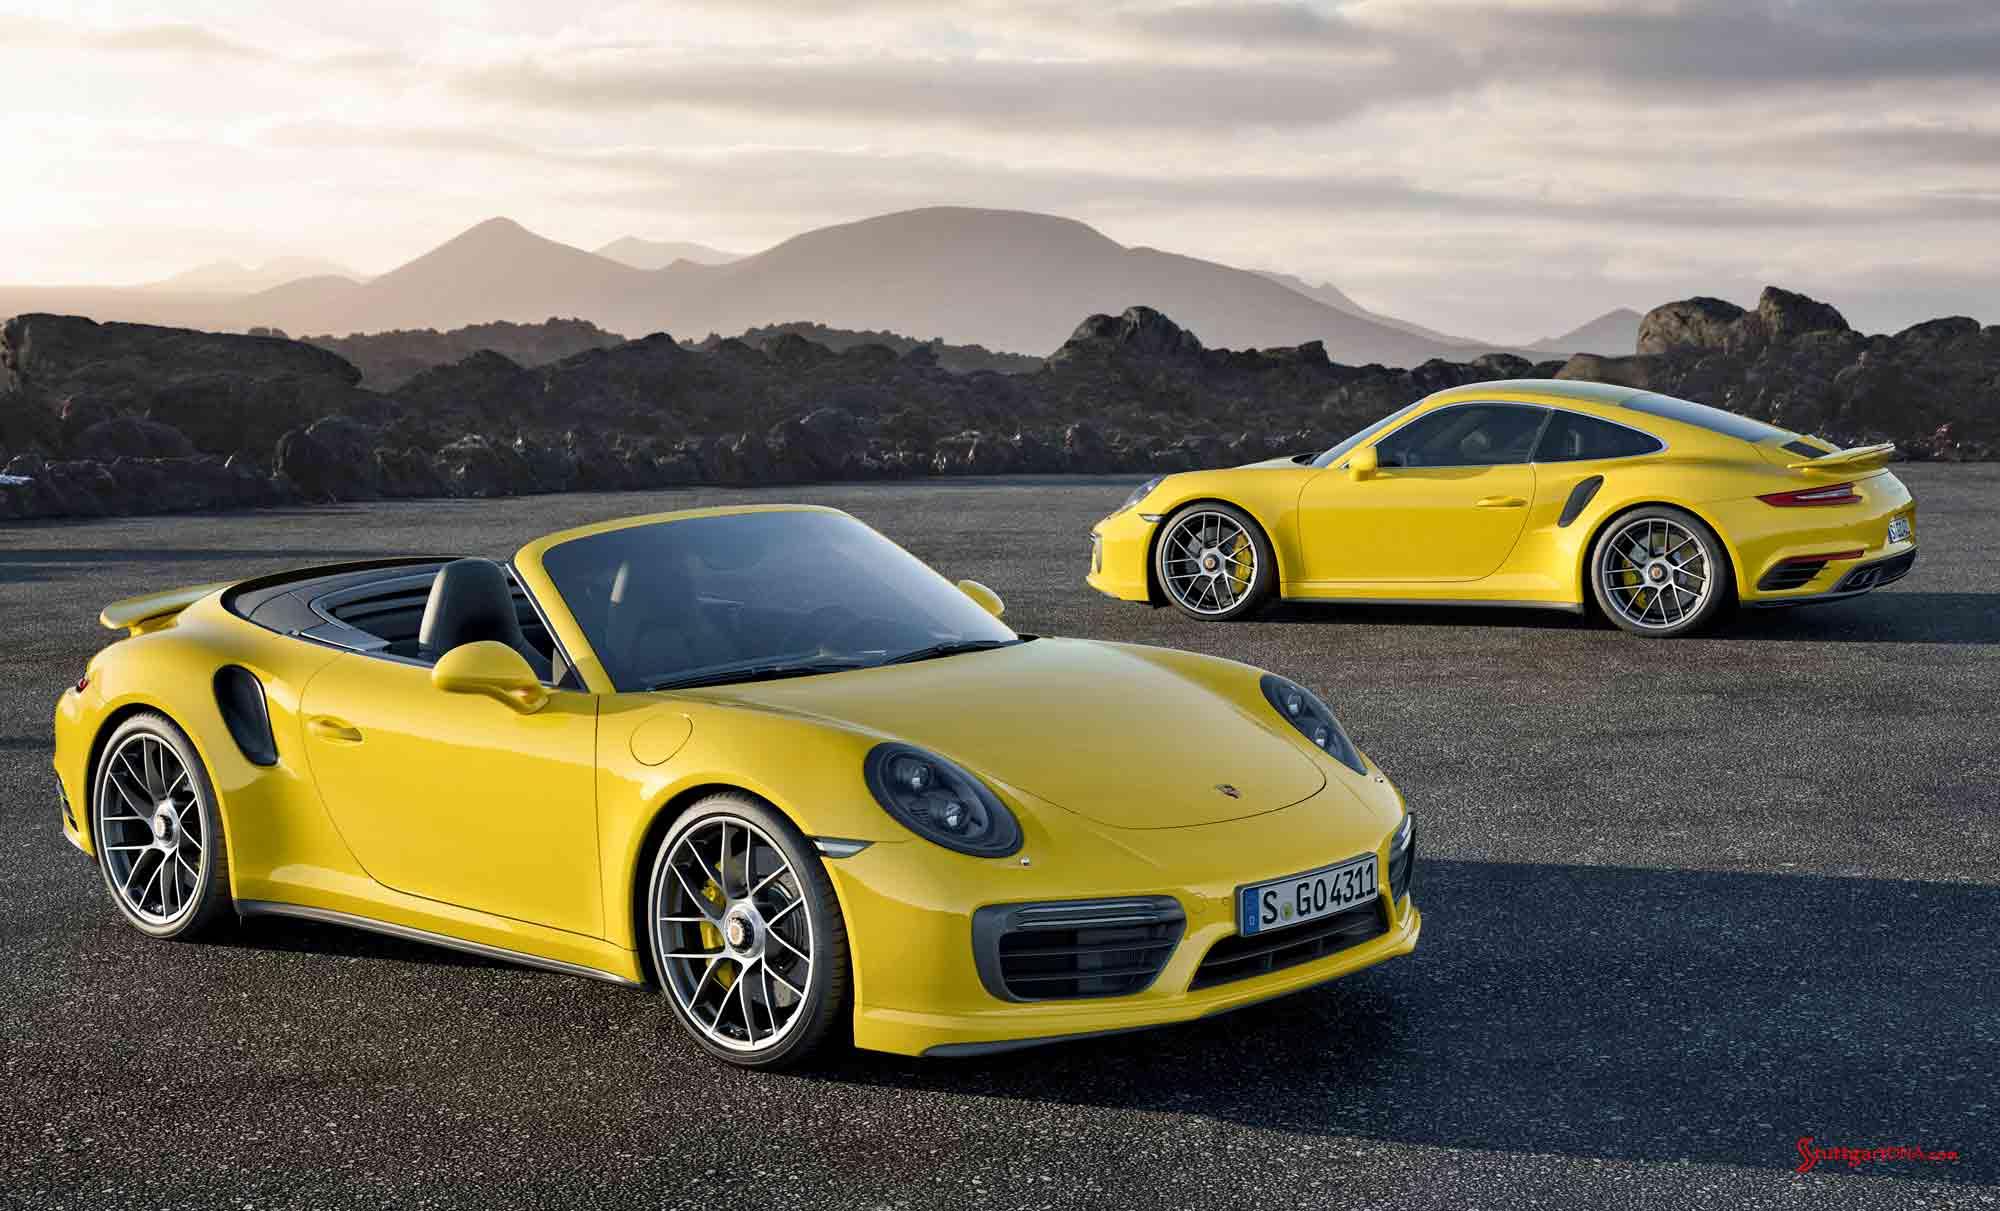 Two-yellow-2017-991-2-Turbos Mesmerizing Porsche 918 Spyder London Ontario Cars Trend